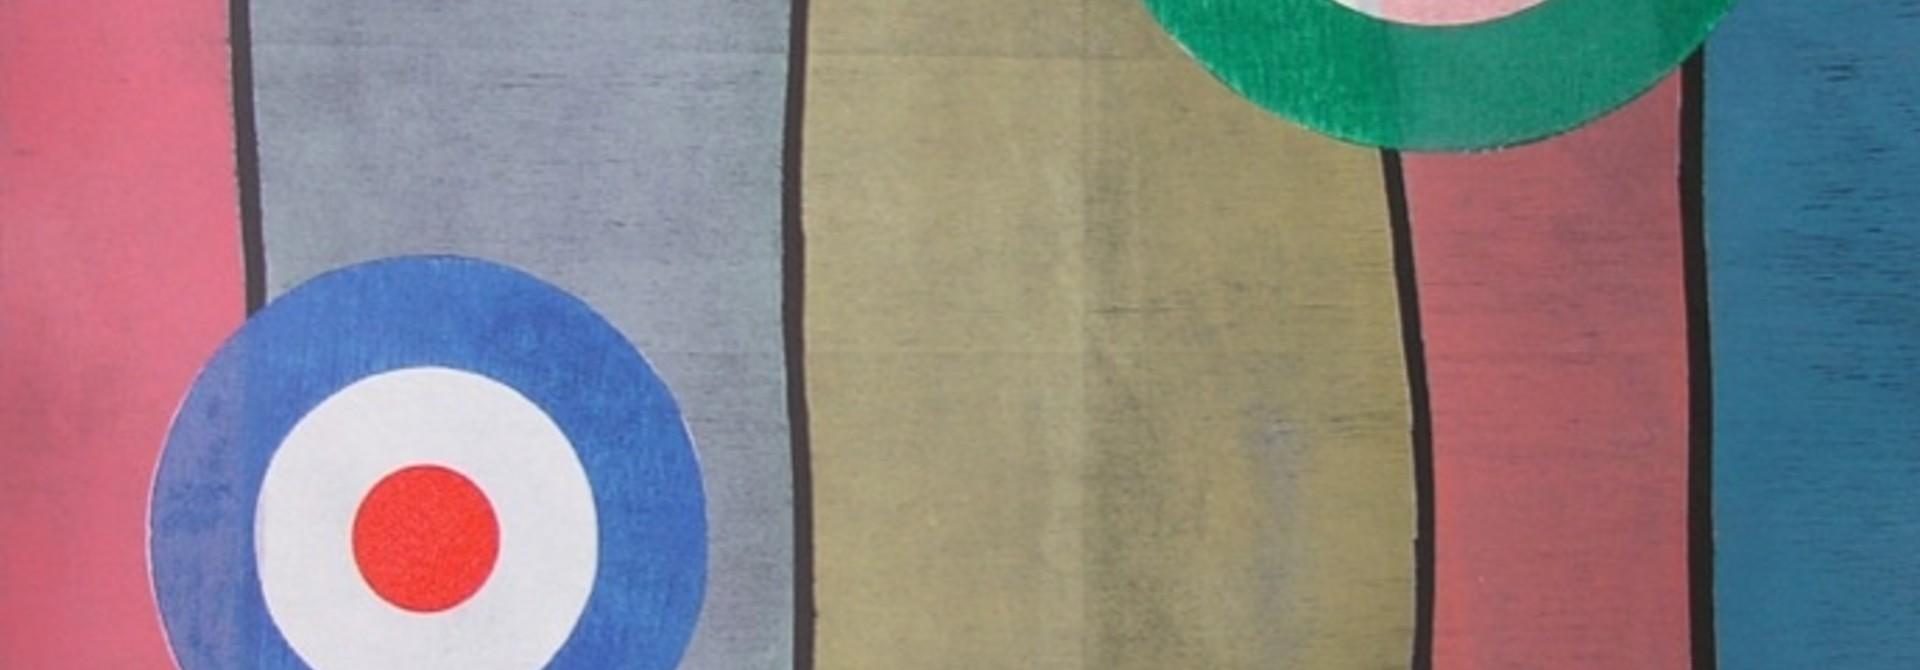 Circles, Targets, Elements